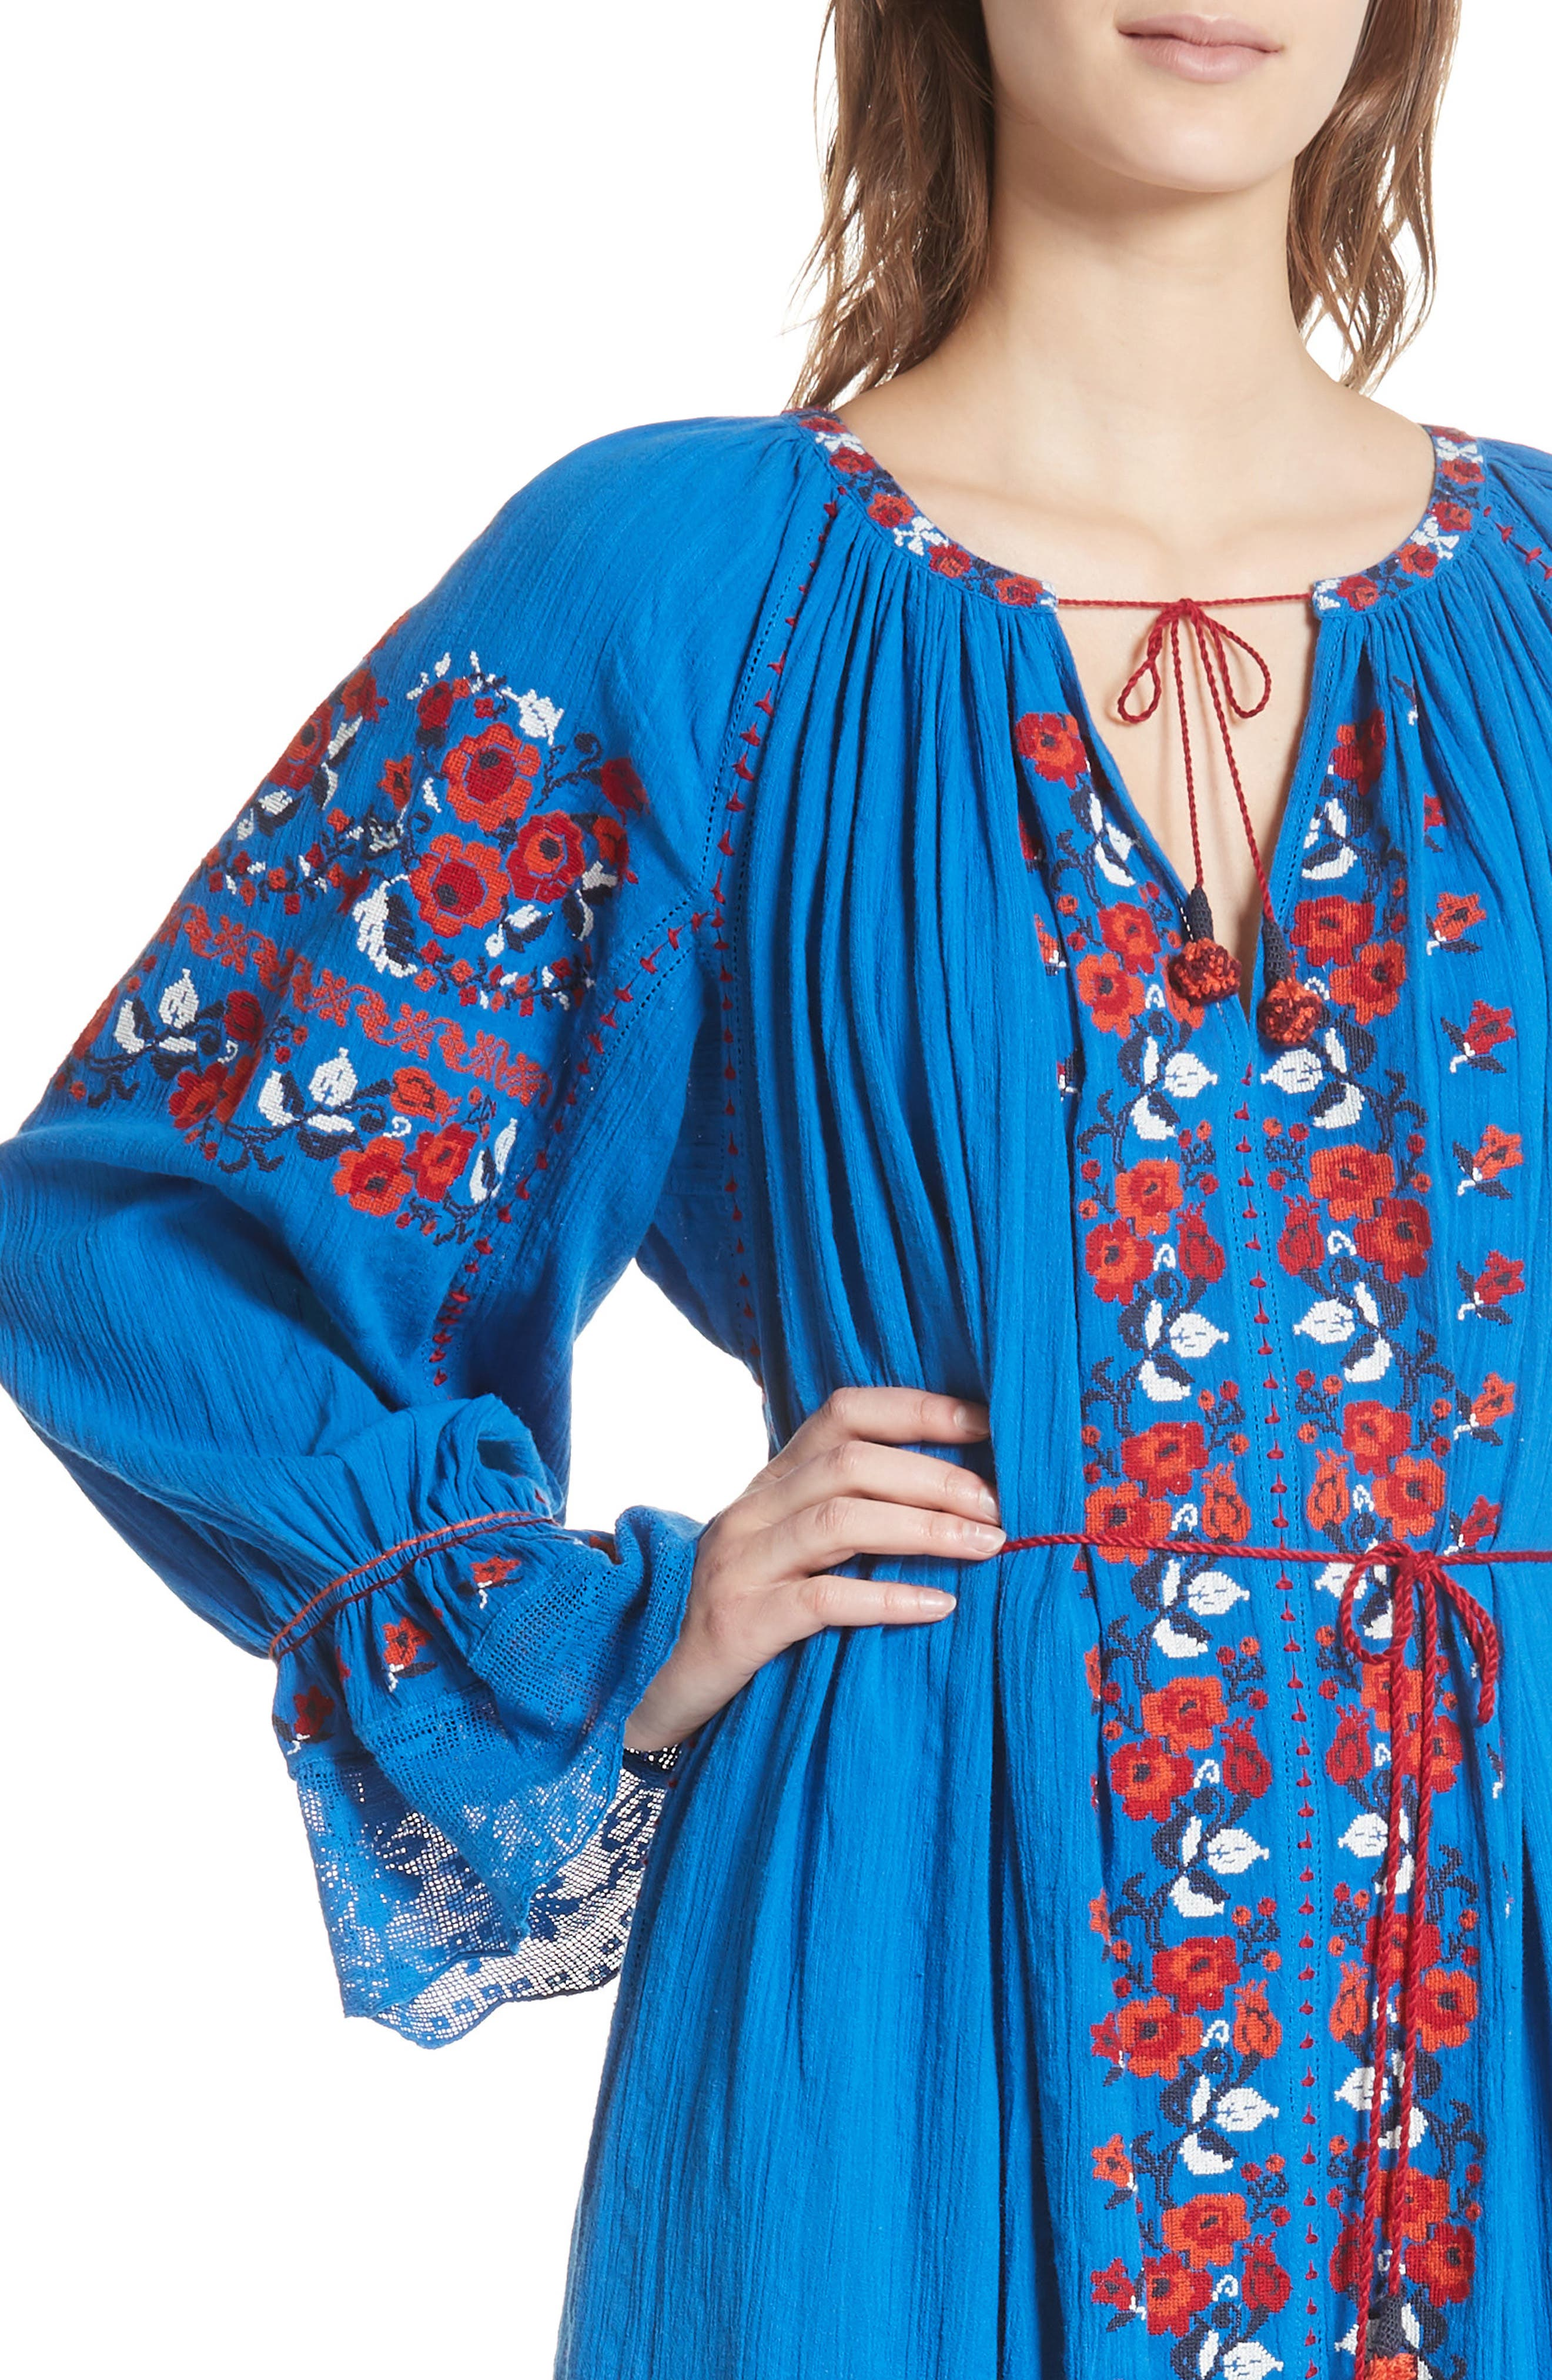 Filia Embroidered Midi Dress,                             Alternate thumbnail 4, color,                             Cobalt